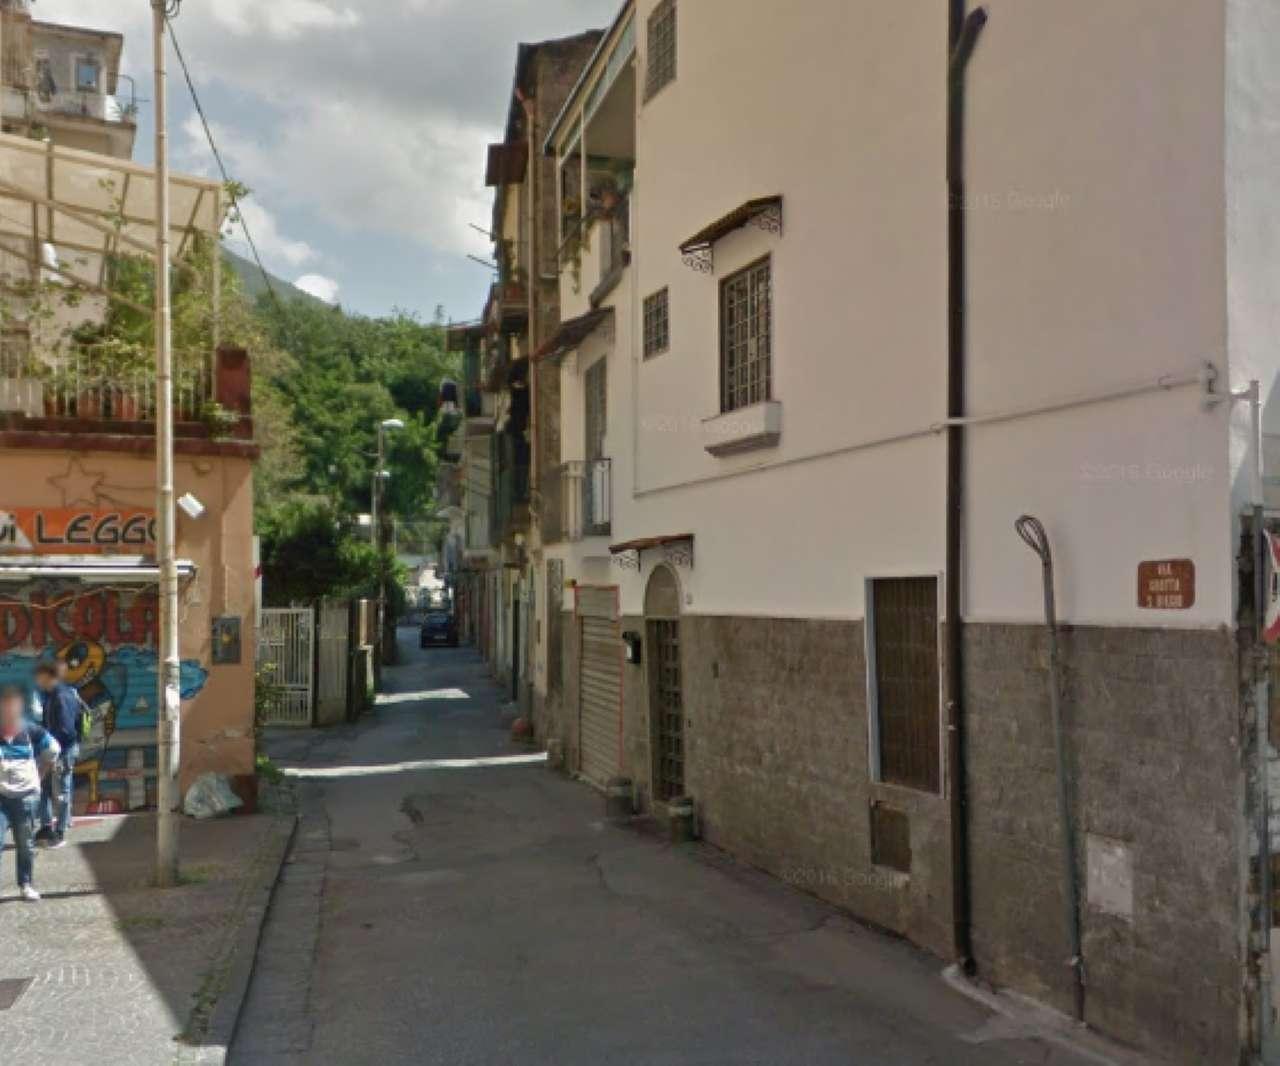 Soluzione Indipendente in vendita a Castellammare di Stabia, 9 locali, Trattative riservate | Cambio Casa.it